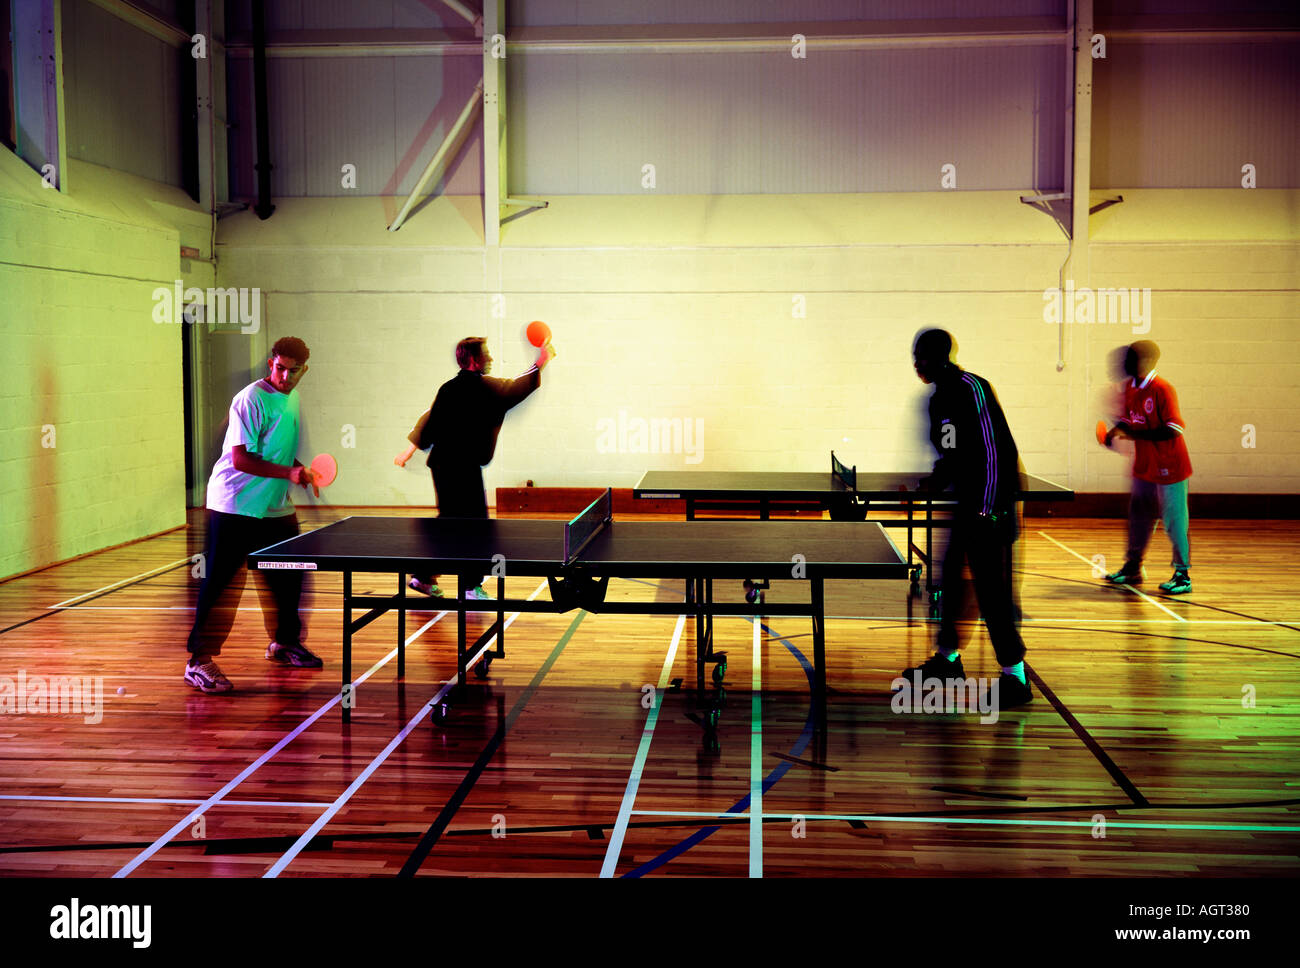 table tennis at Lewisham College - Stock Image